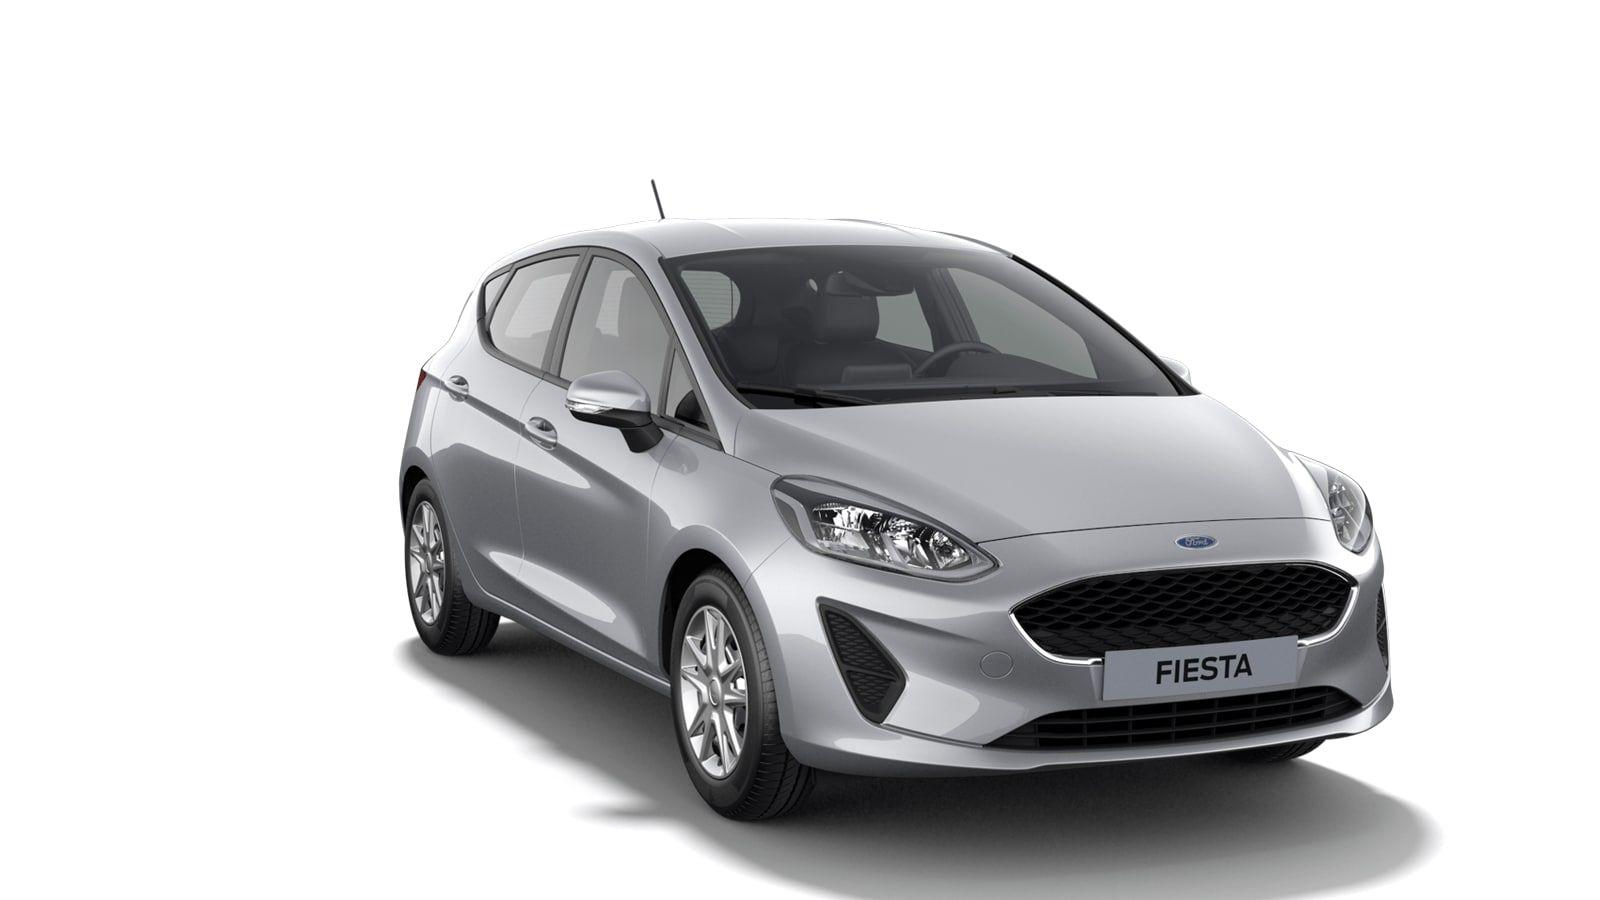 "Nieuw Ford All-new ford fiesta Connected 1.0i EcoBoost 95pk / 70kW M6 - 5d JK6 - Metaalkleur ""Moondust Silver"" 2"